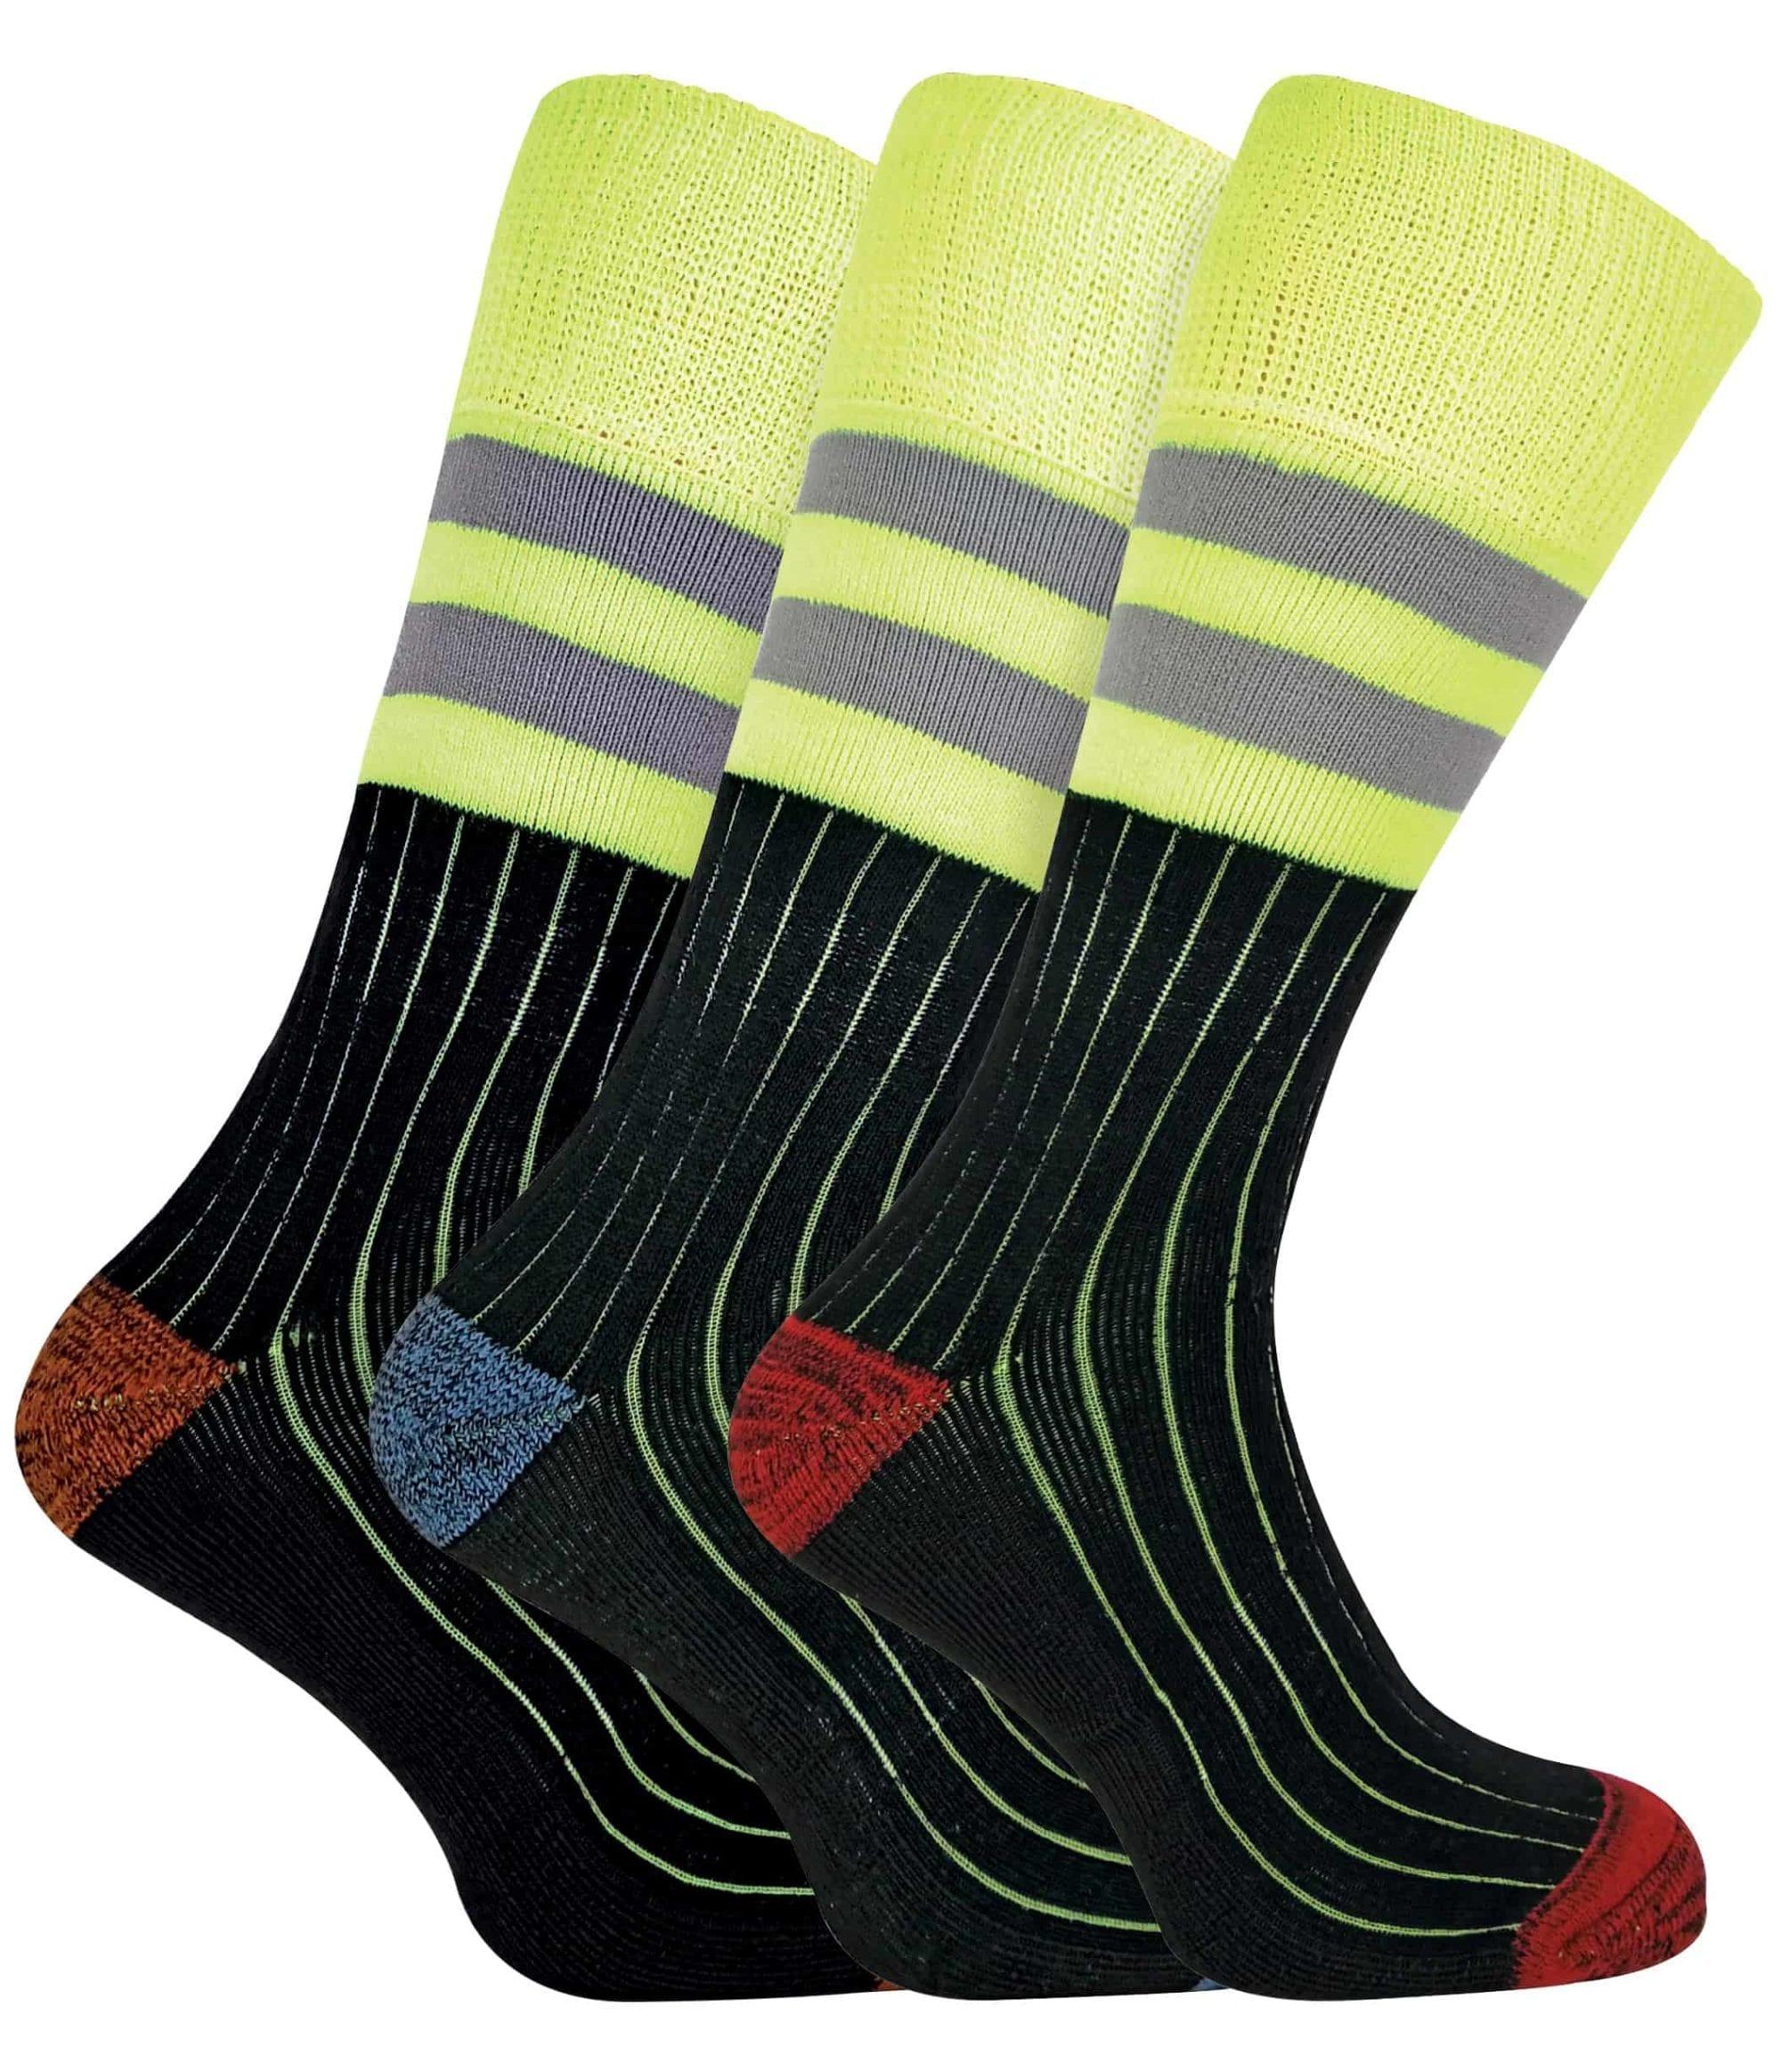 Mens Heavy Duty Work Boot Socks Reinforced Heel Toe 3 Pairs Cushioned Sports ...